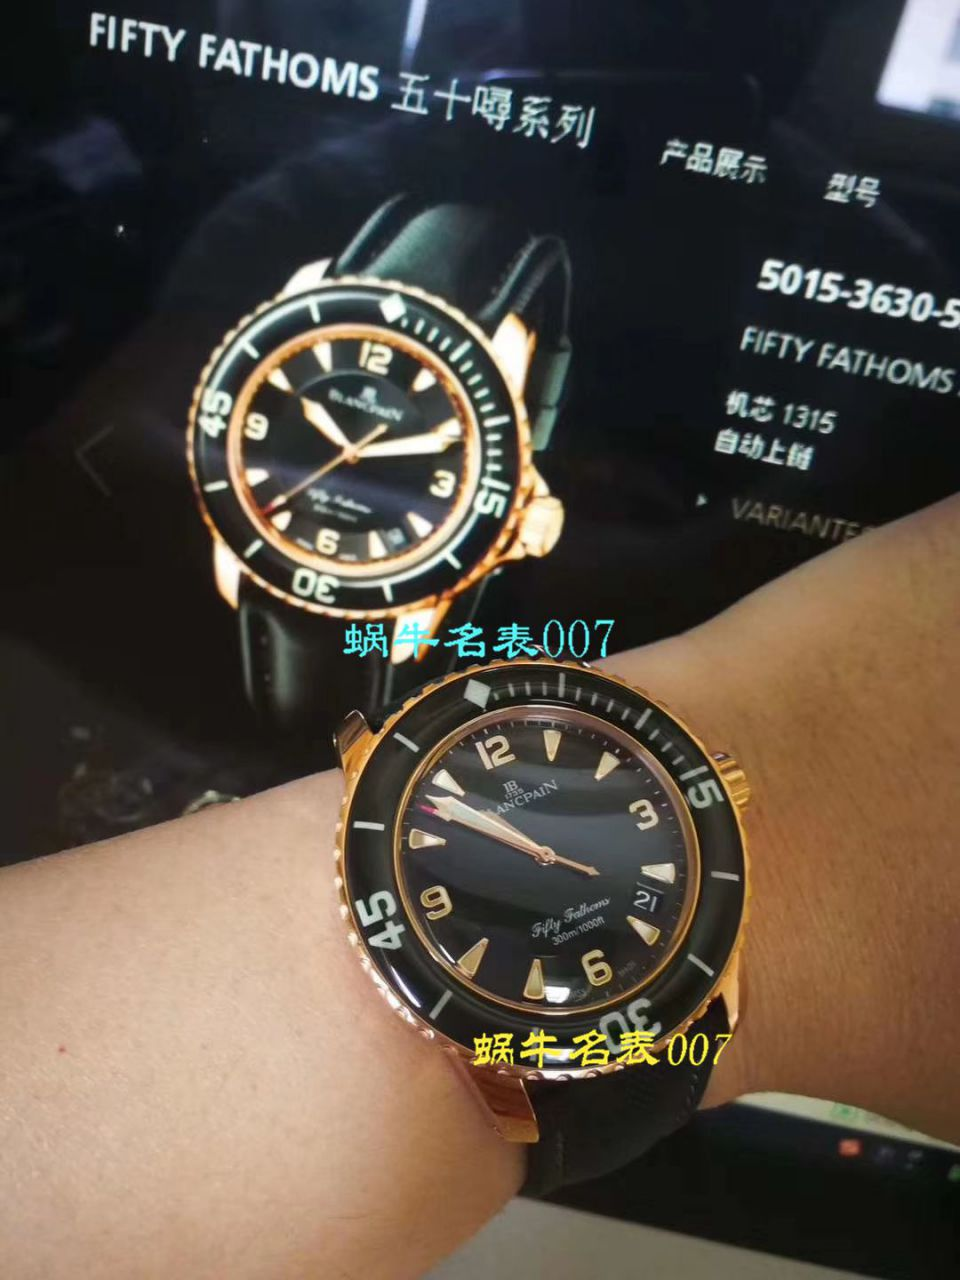 【ZF厂一比一超A高仿手表】宝珀五十噚系列5015-1130-52腕表